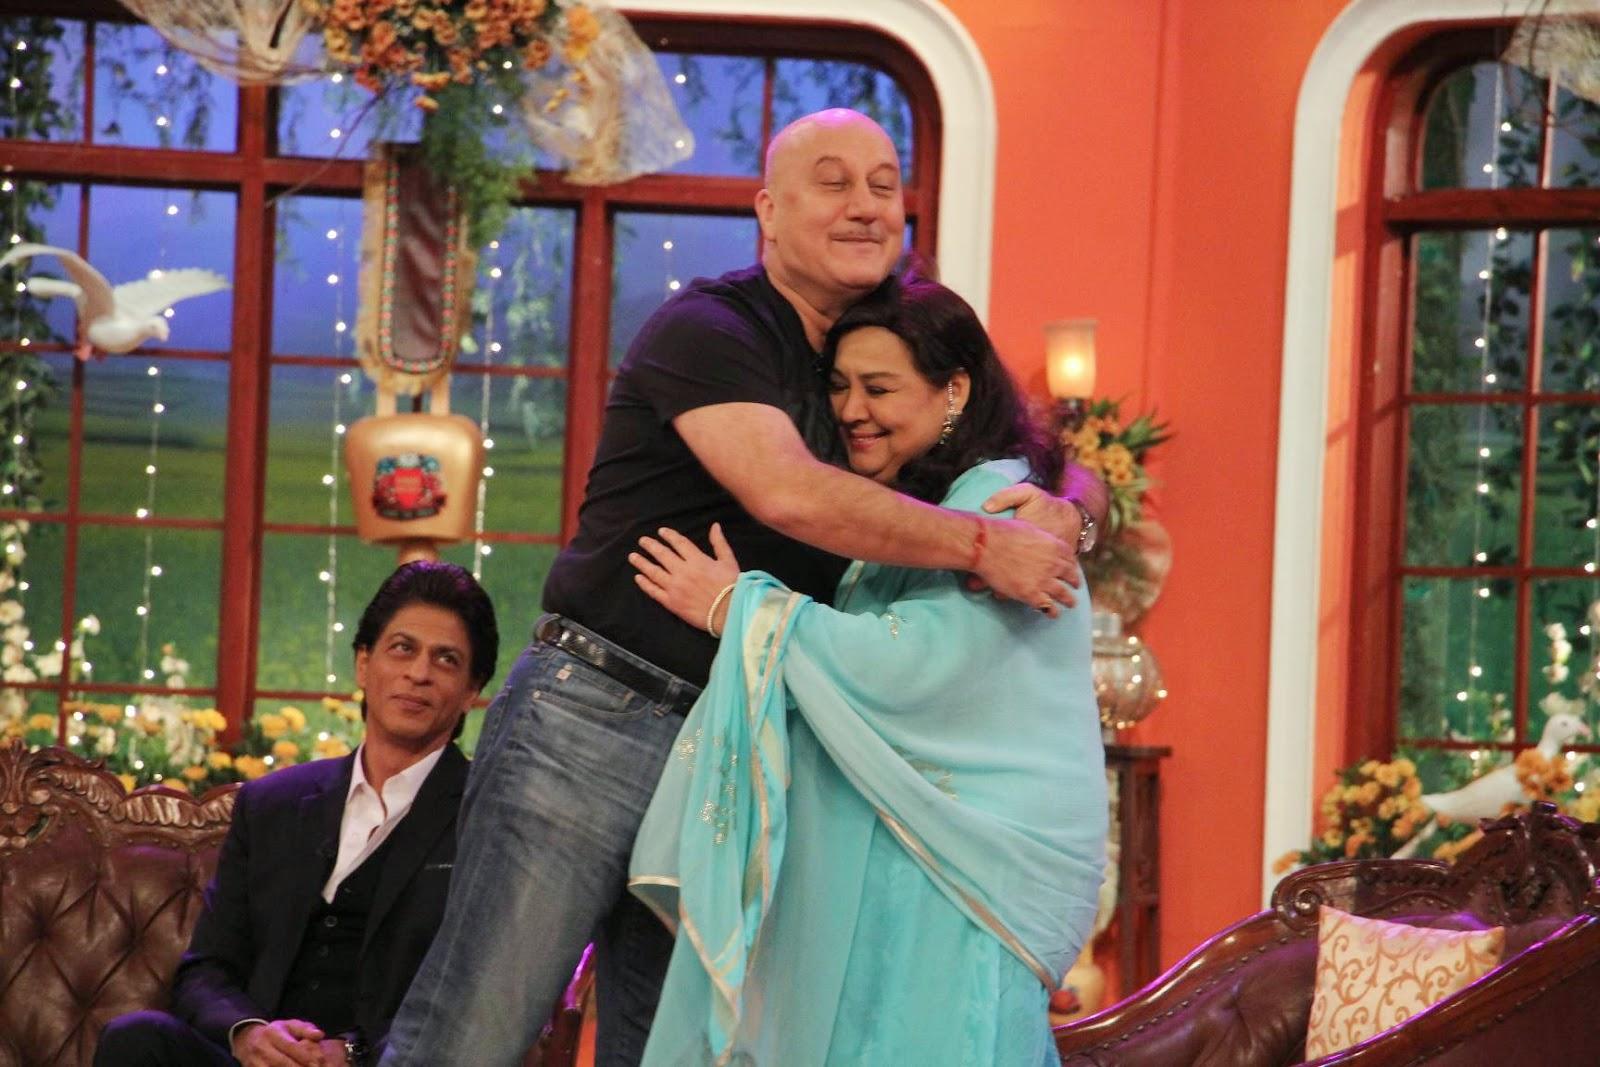 Kajol Photos At Comedy Nights With Kapil Sets, Shah Rukh Khan-Kajol DDLJ Team on CNWK